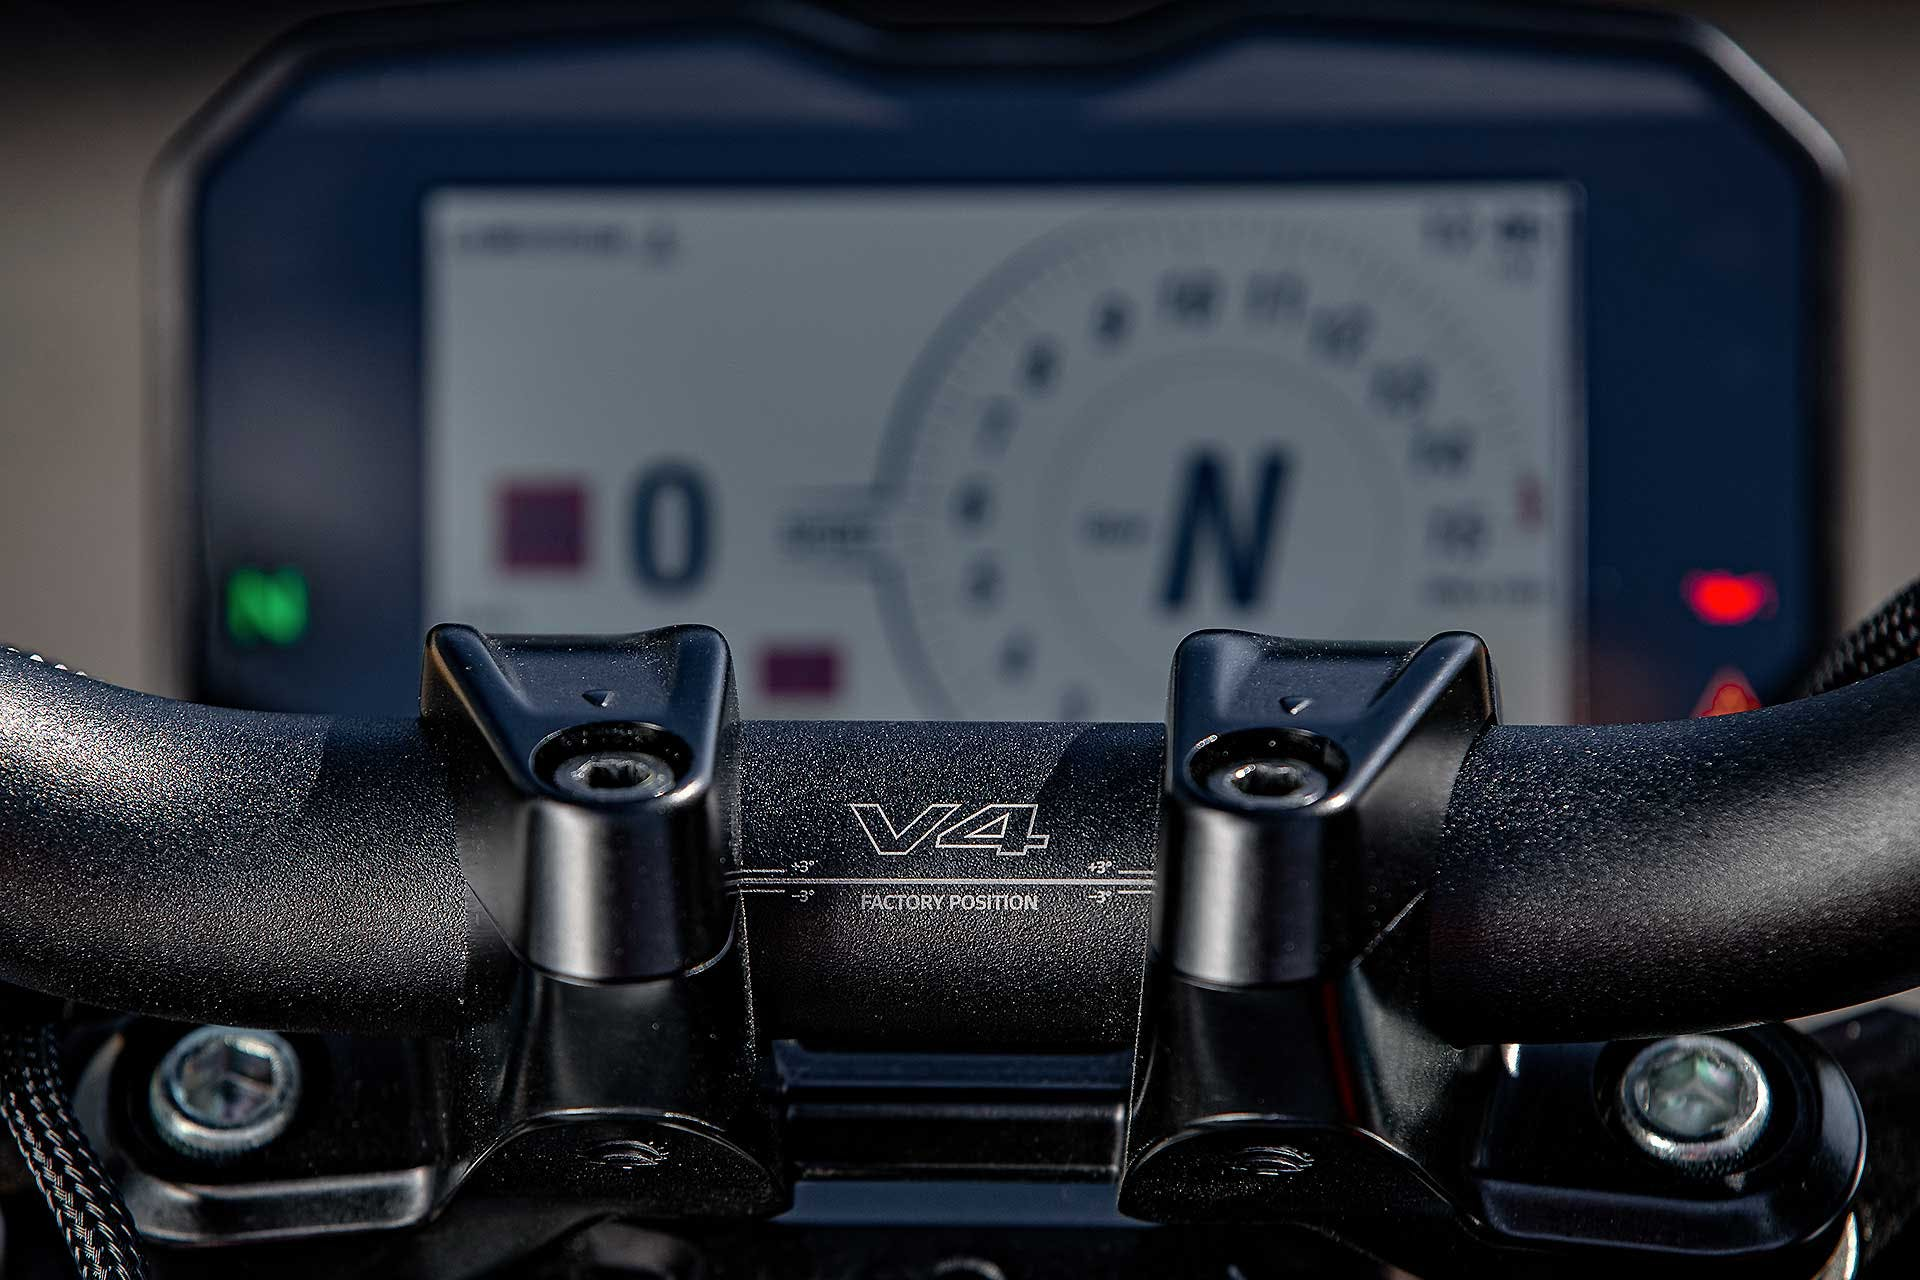 Ducati Streetfighter V4 S Dettaglio maniubrio regolabile